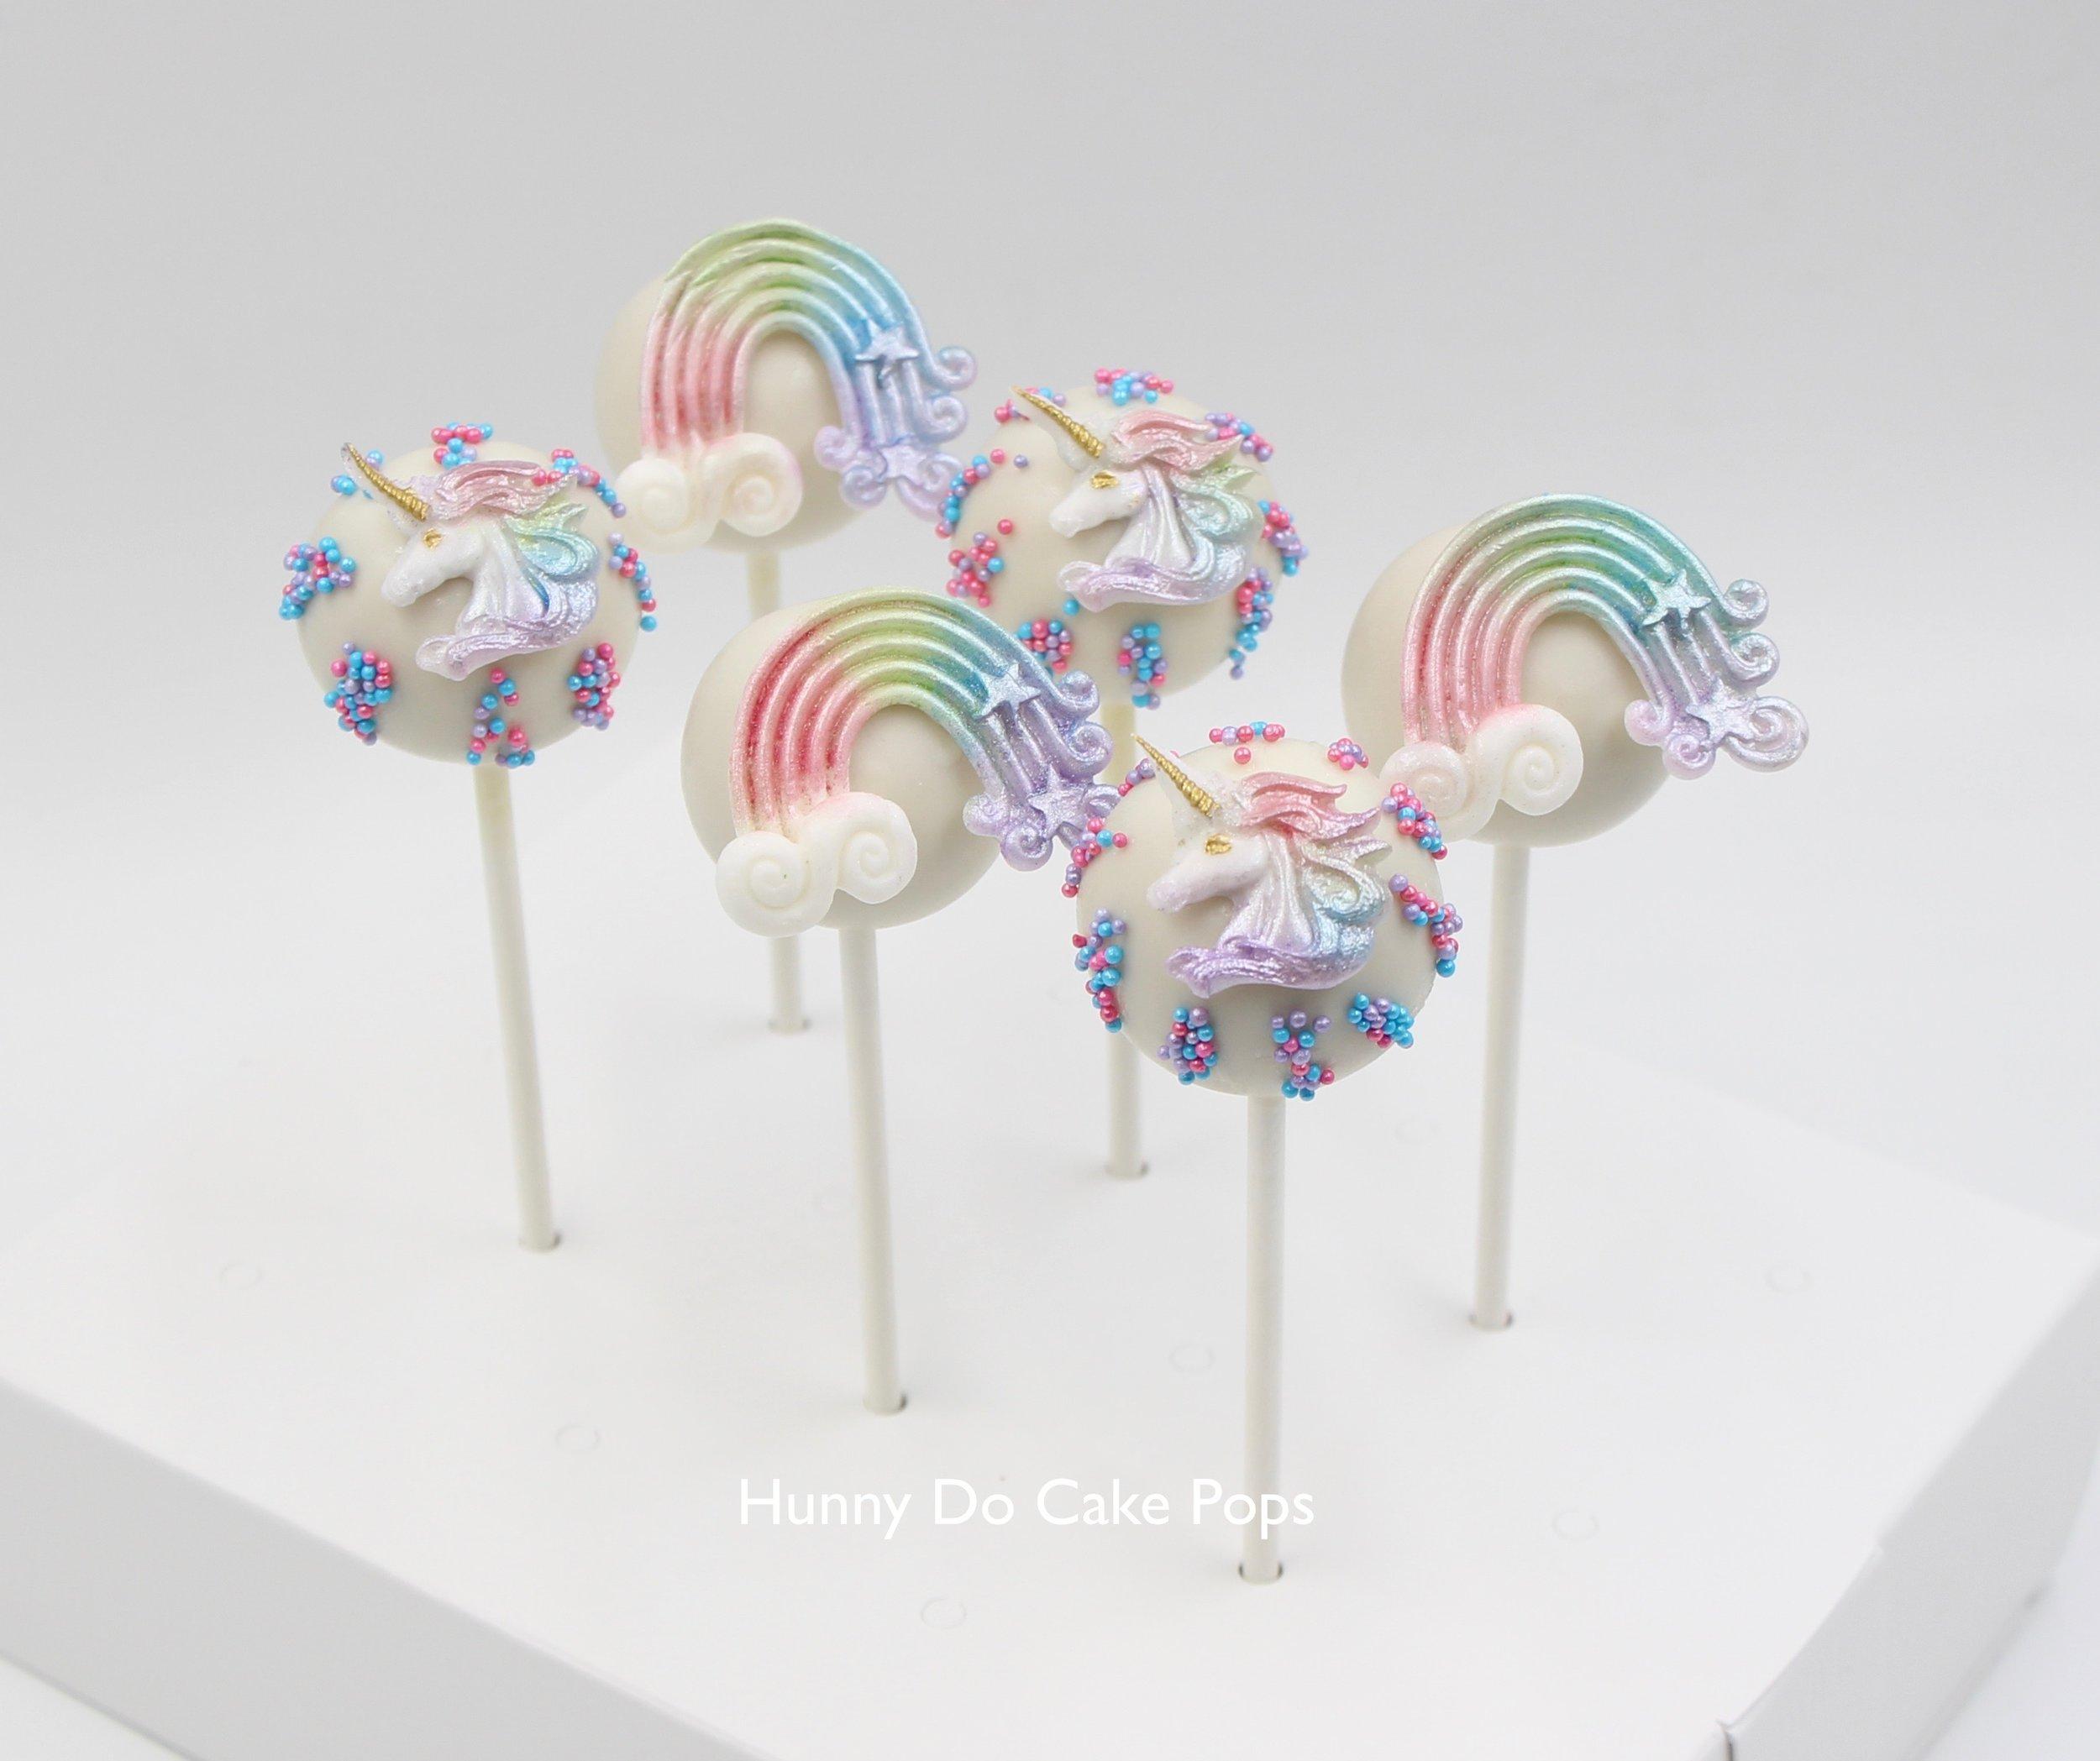 Rainbow Unicorn Cake Pops HunnyDo 1.jpg